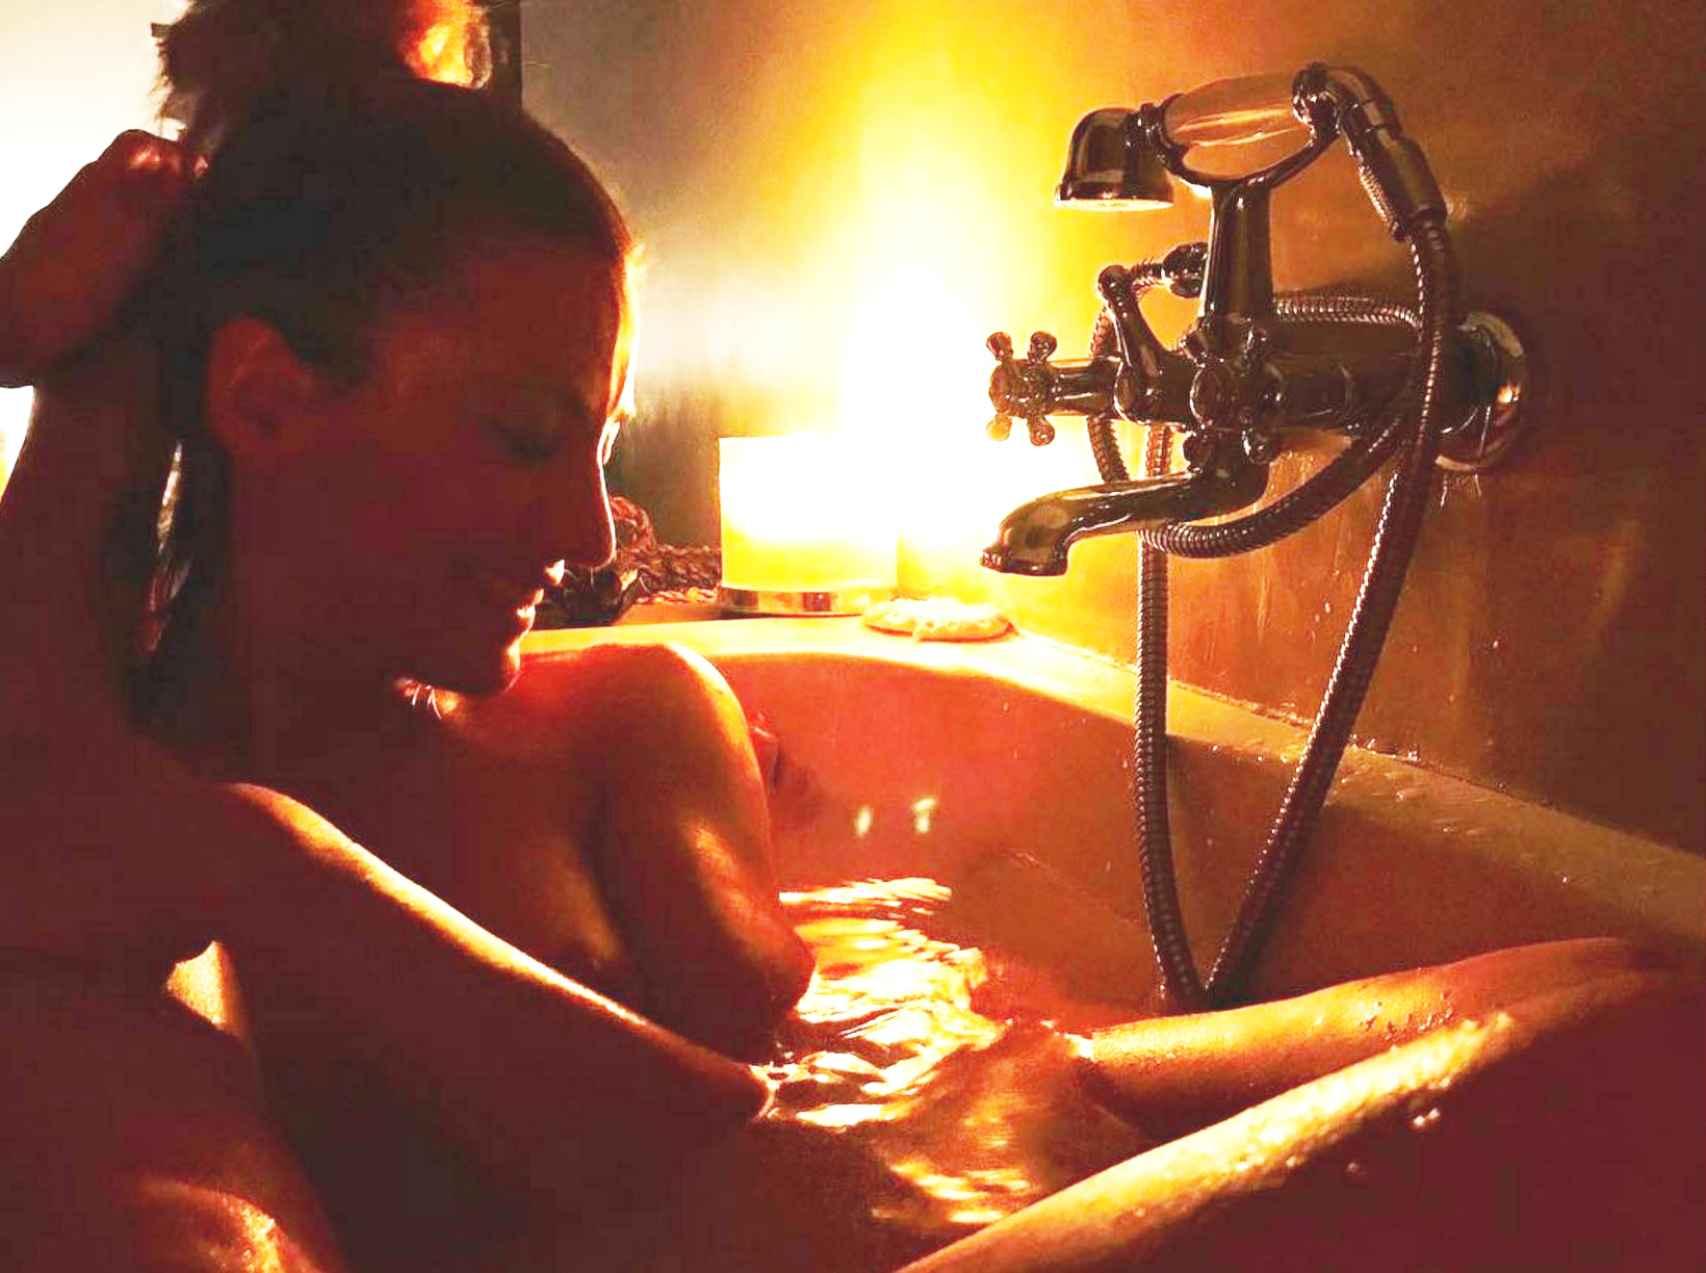 Nagore Robles, en el interior de la bañera acompañada de Sandra Barneda.